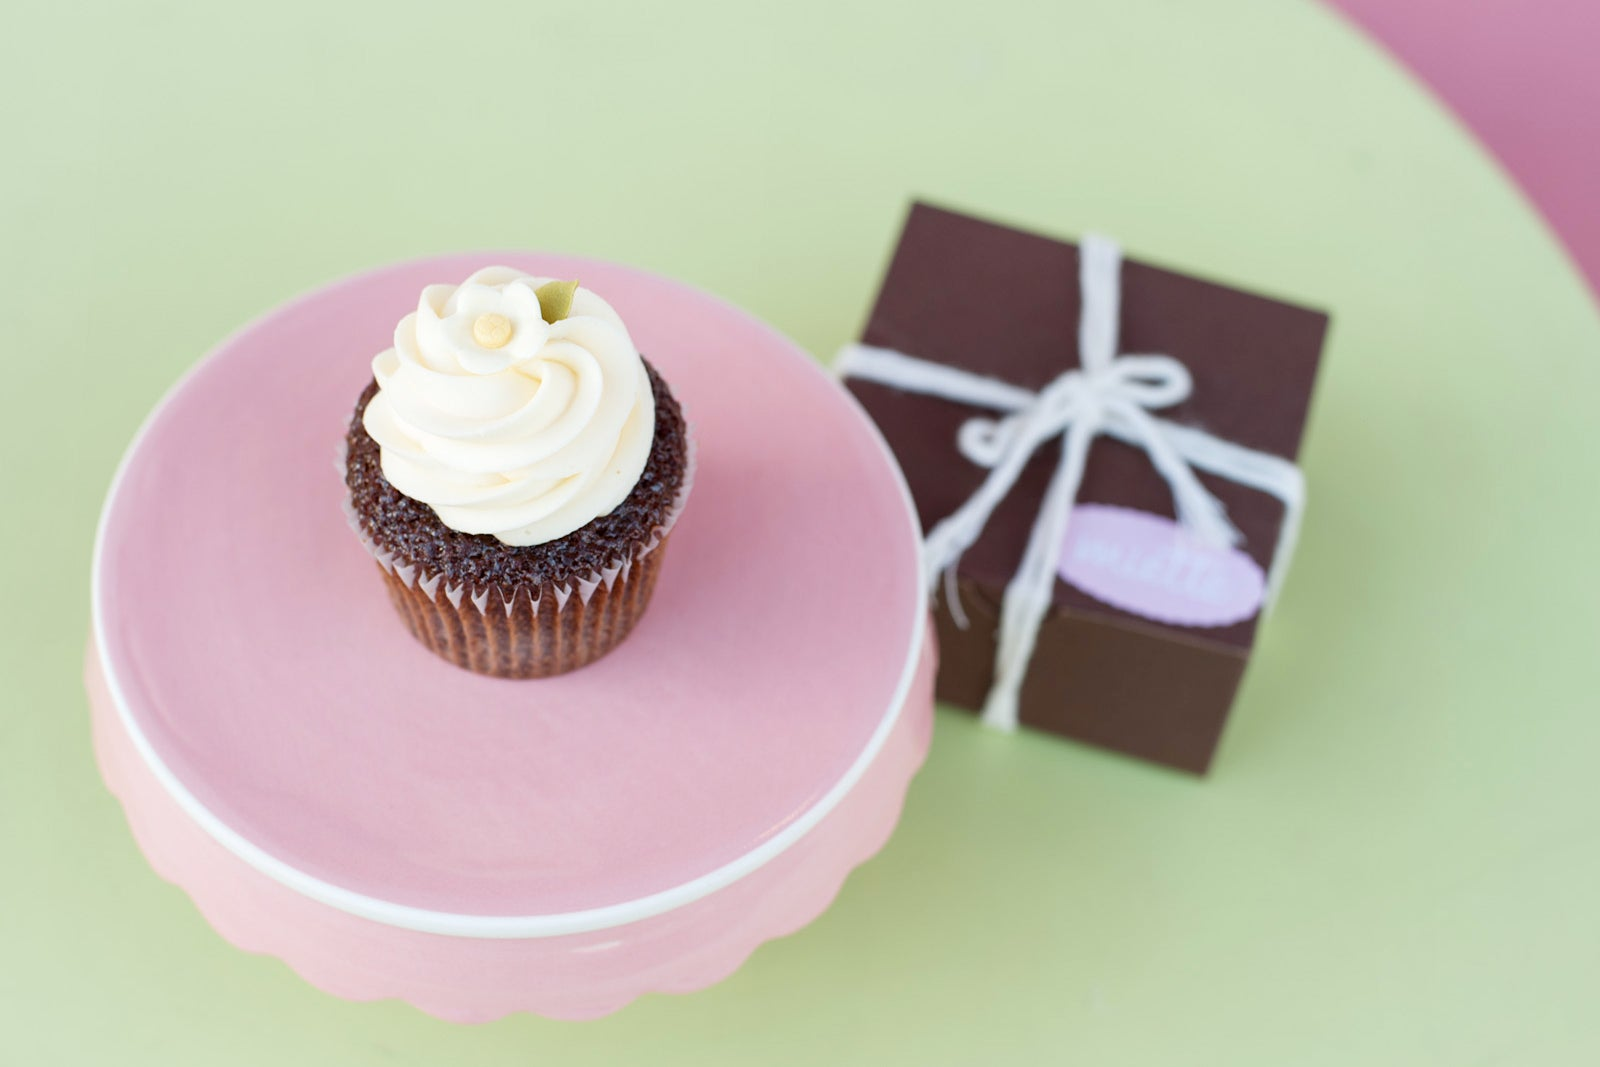 Best Cupcakes San Francisco - Top Cupcake Shops 2013